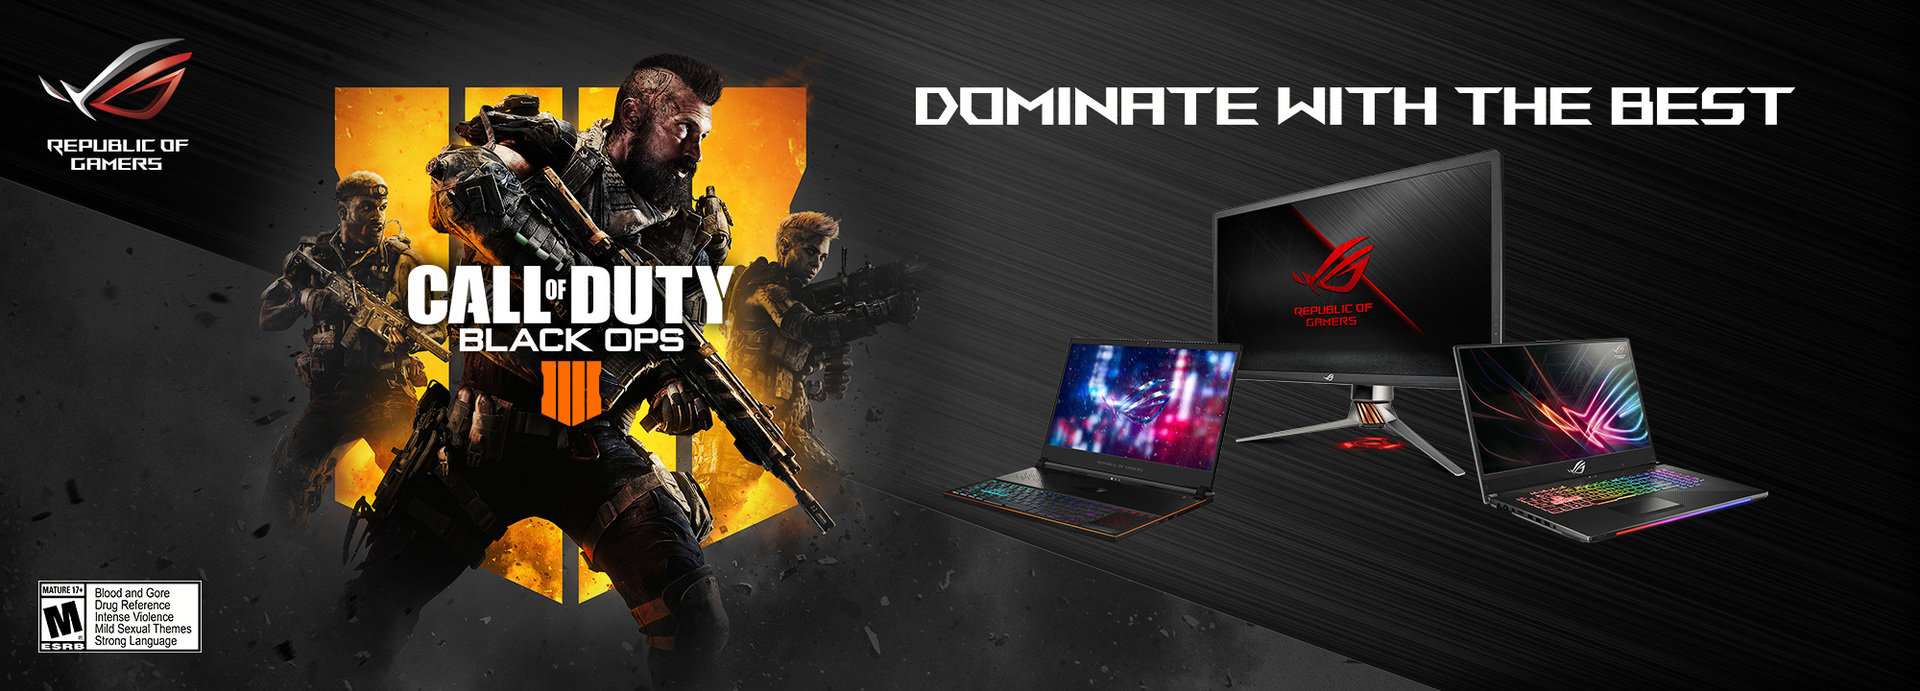 ASUS Republic of Gamers nawiązuję współpracę z Activision wokół gry Call of Duty®: Black Ops 4